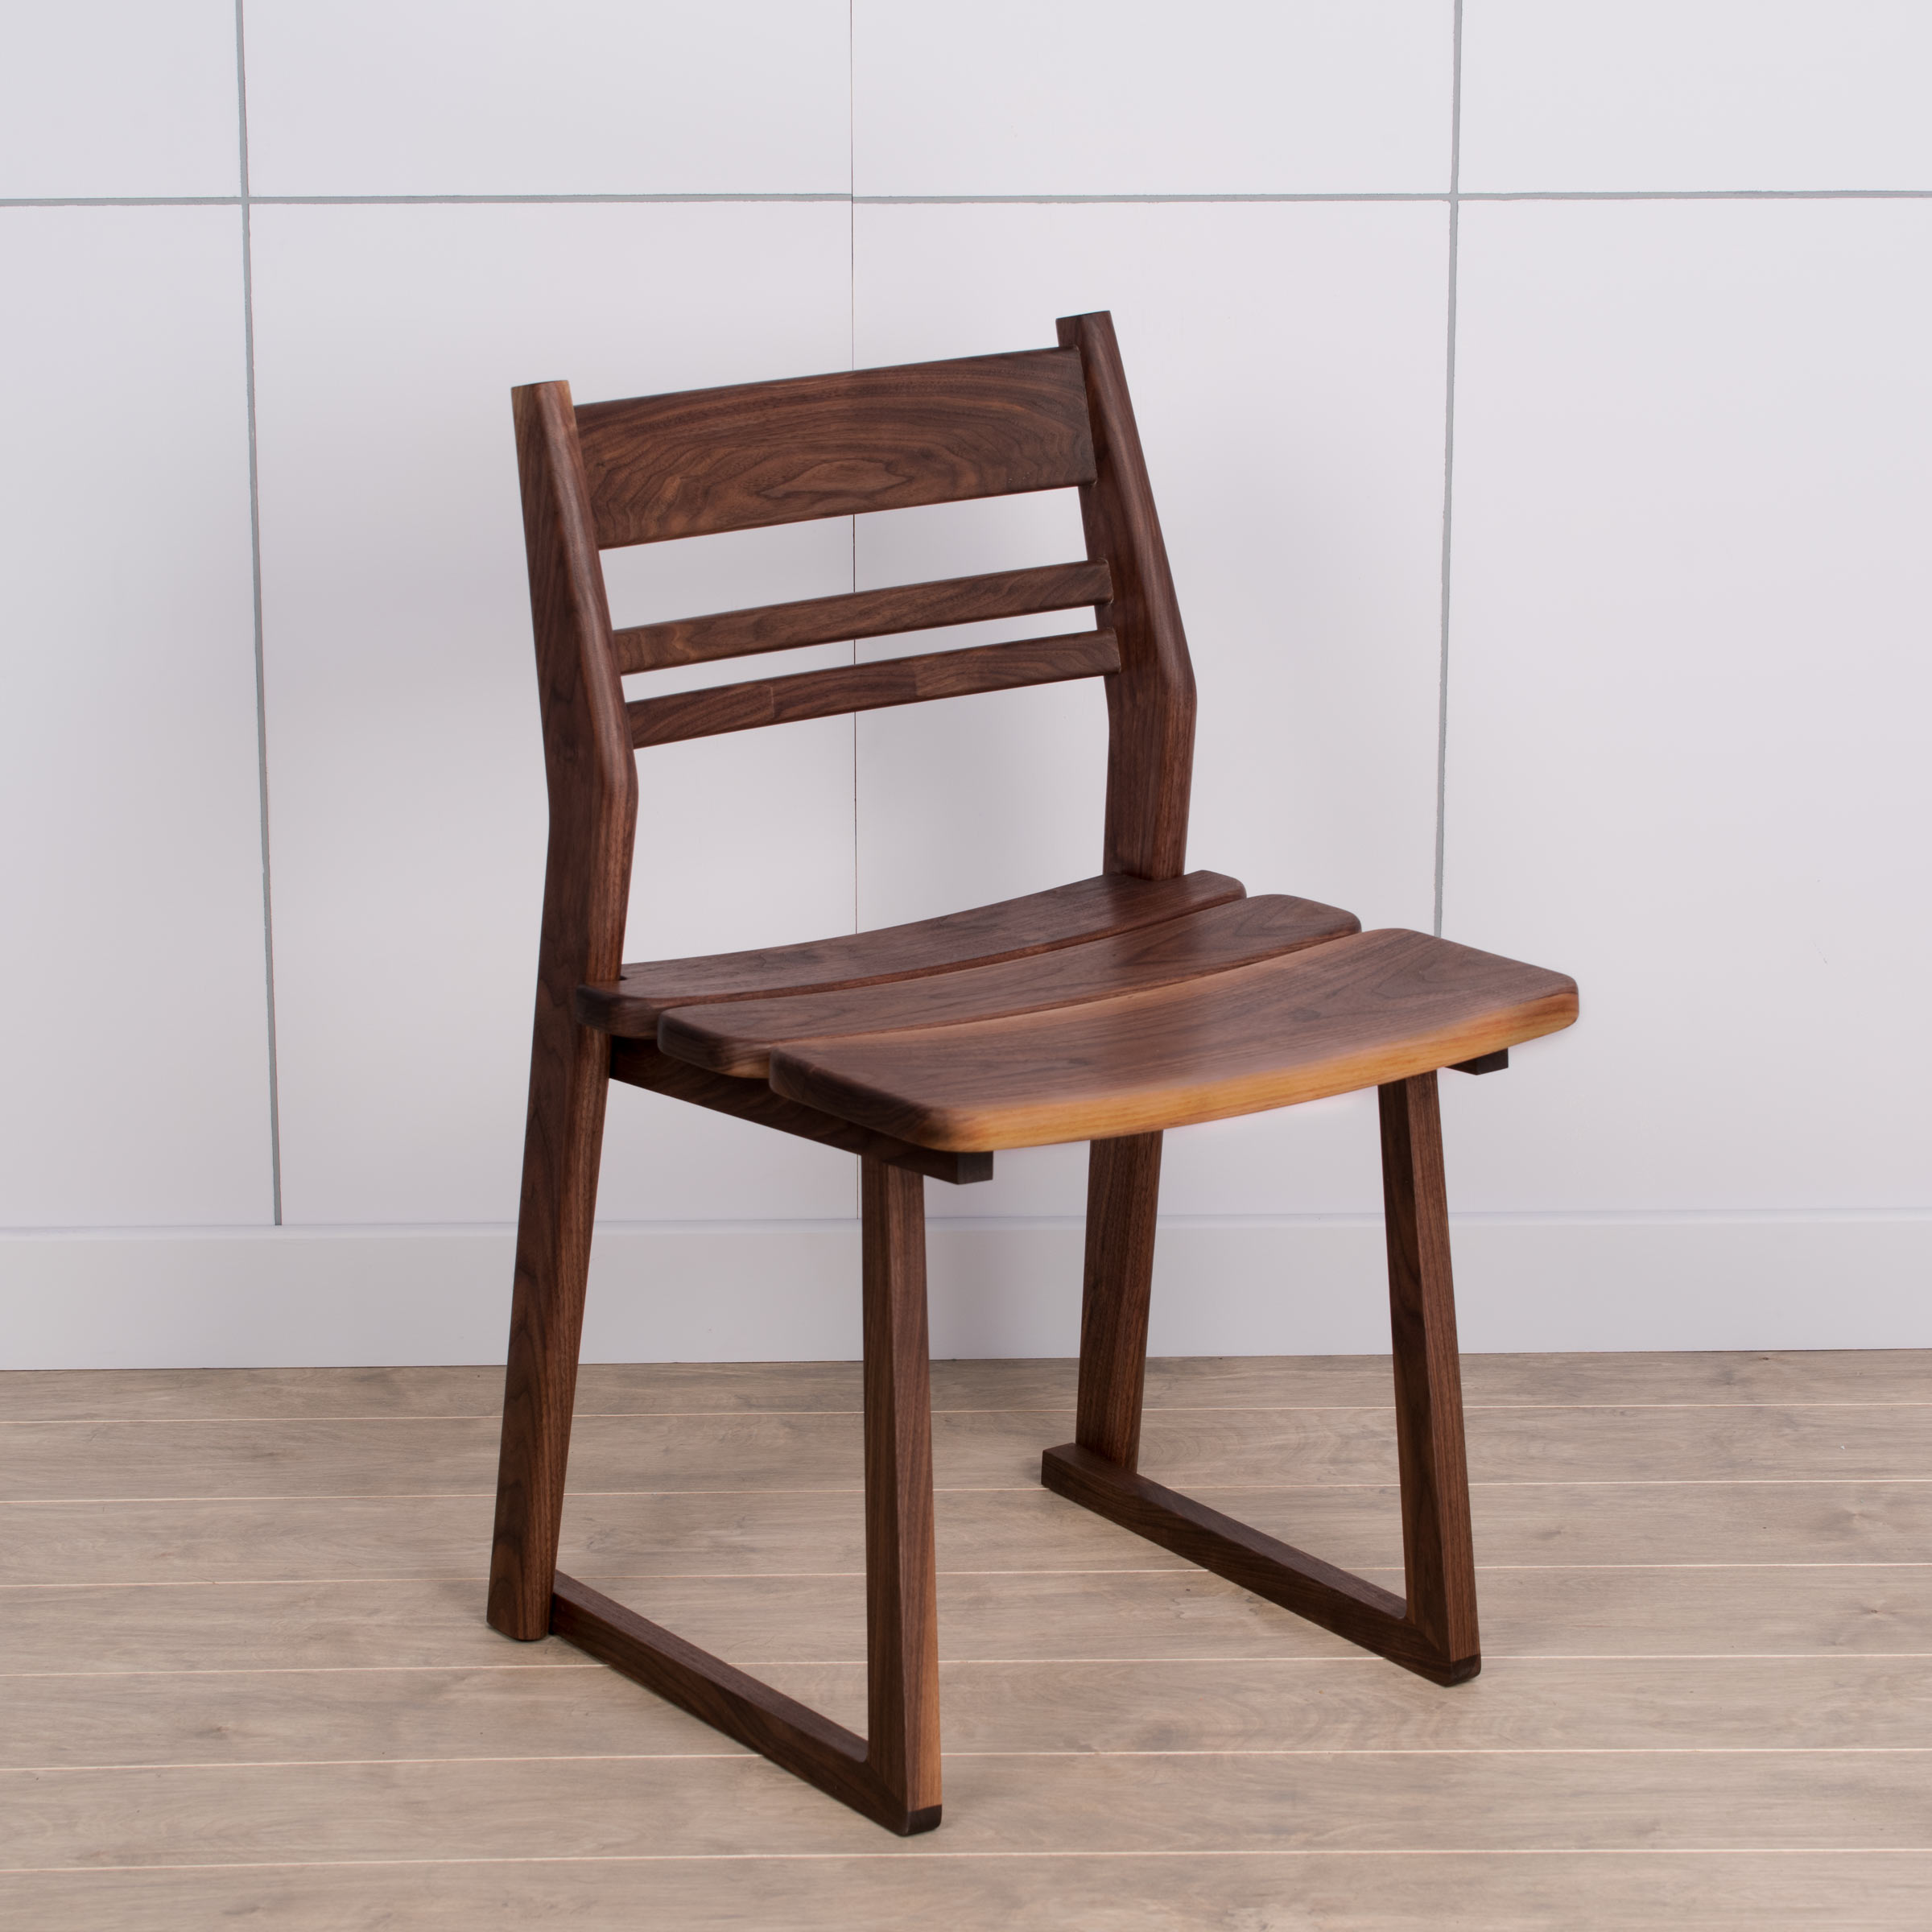 Davenport Original Chair in Walnut